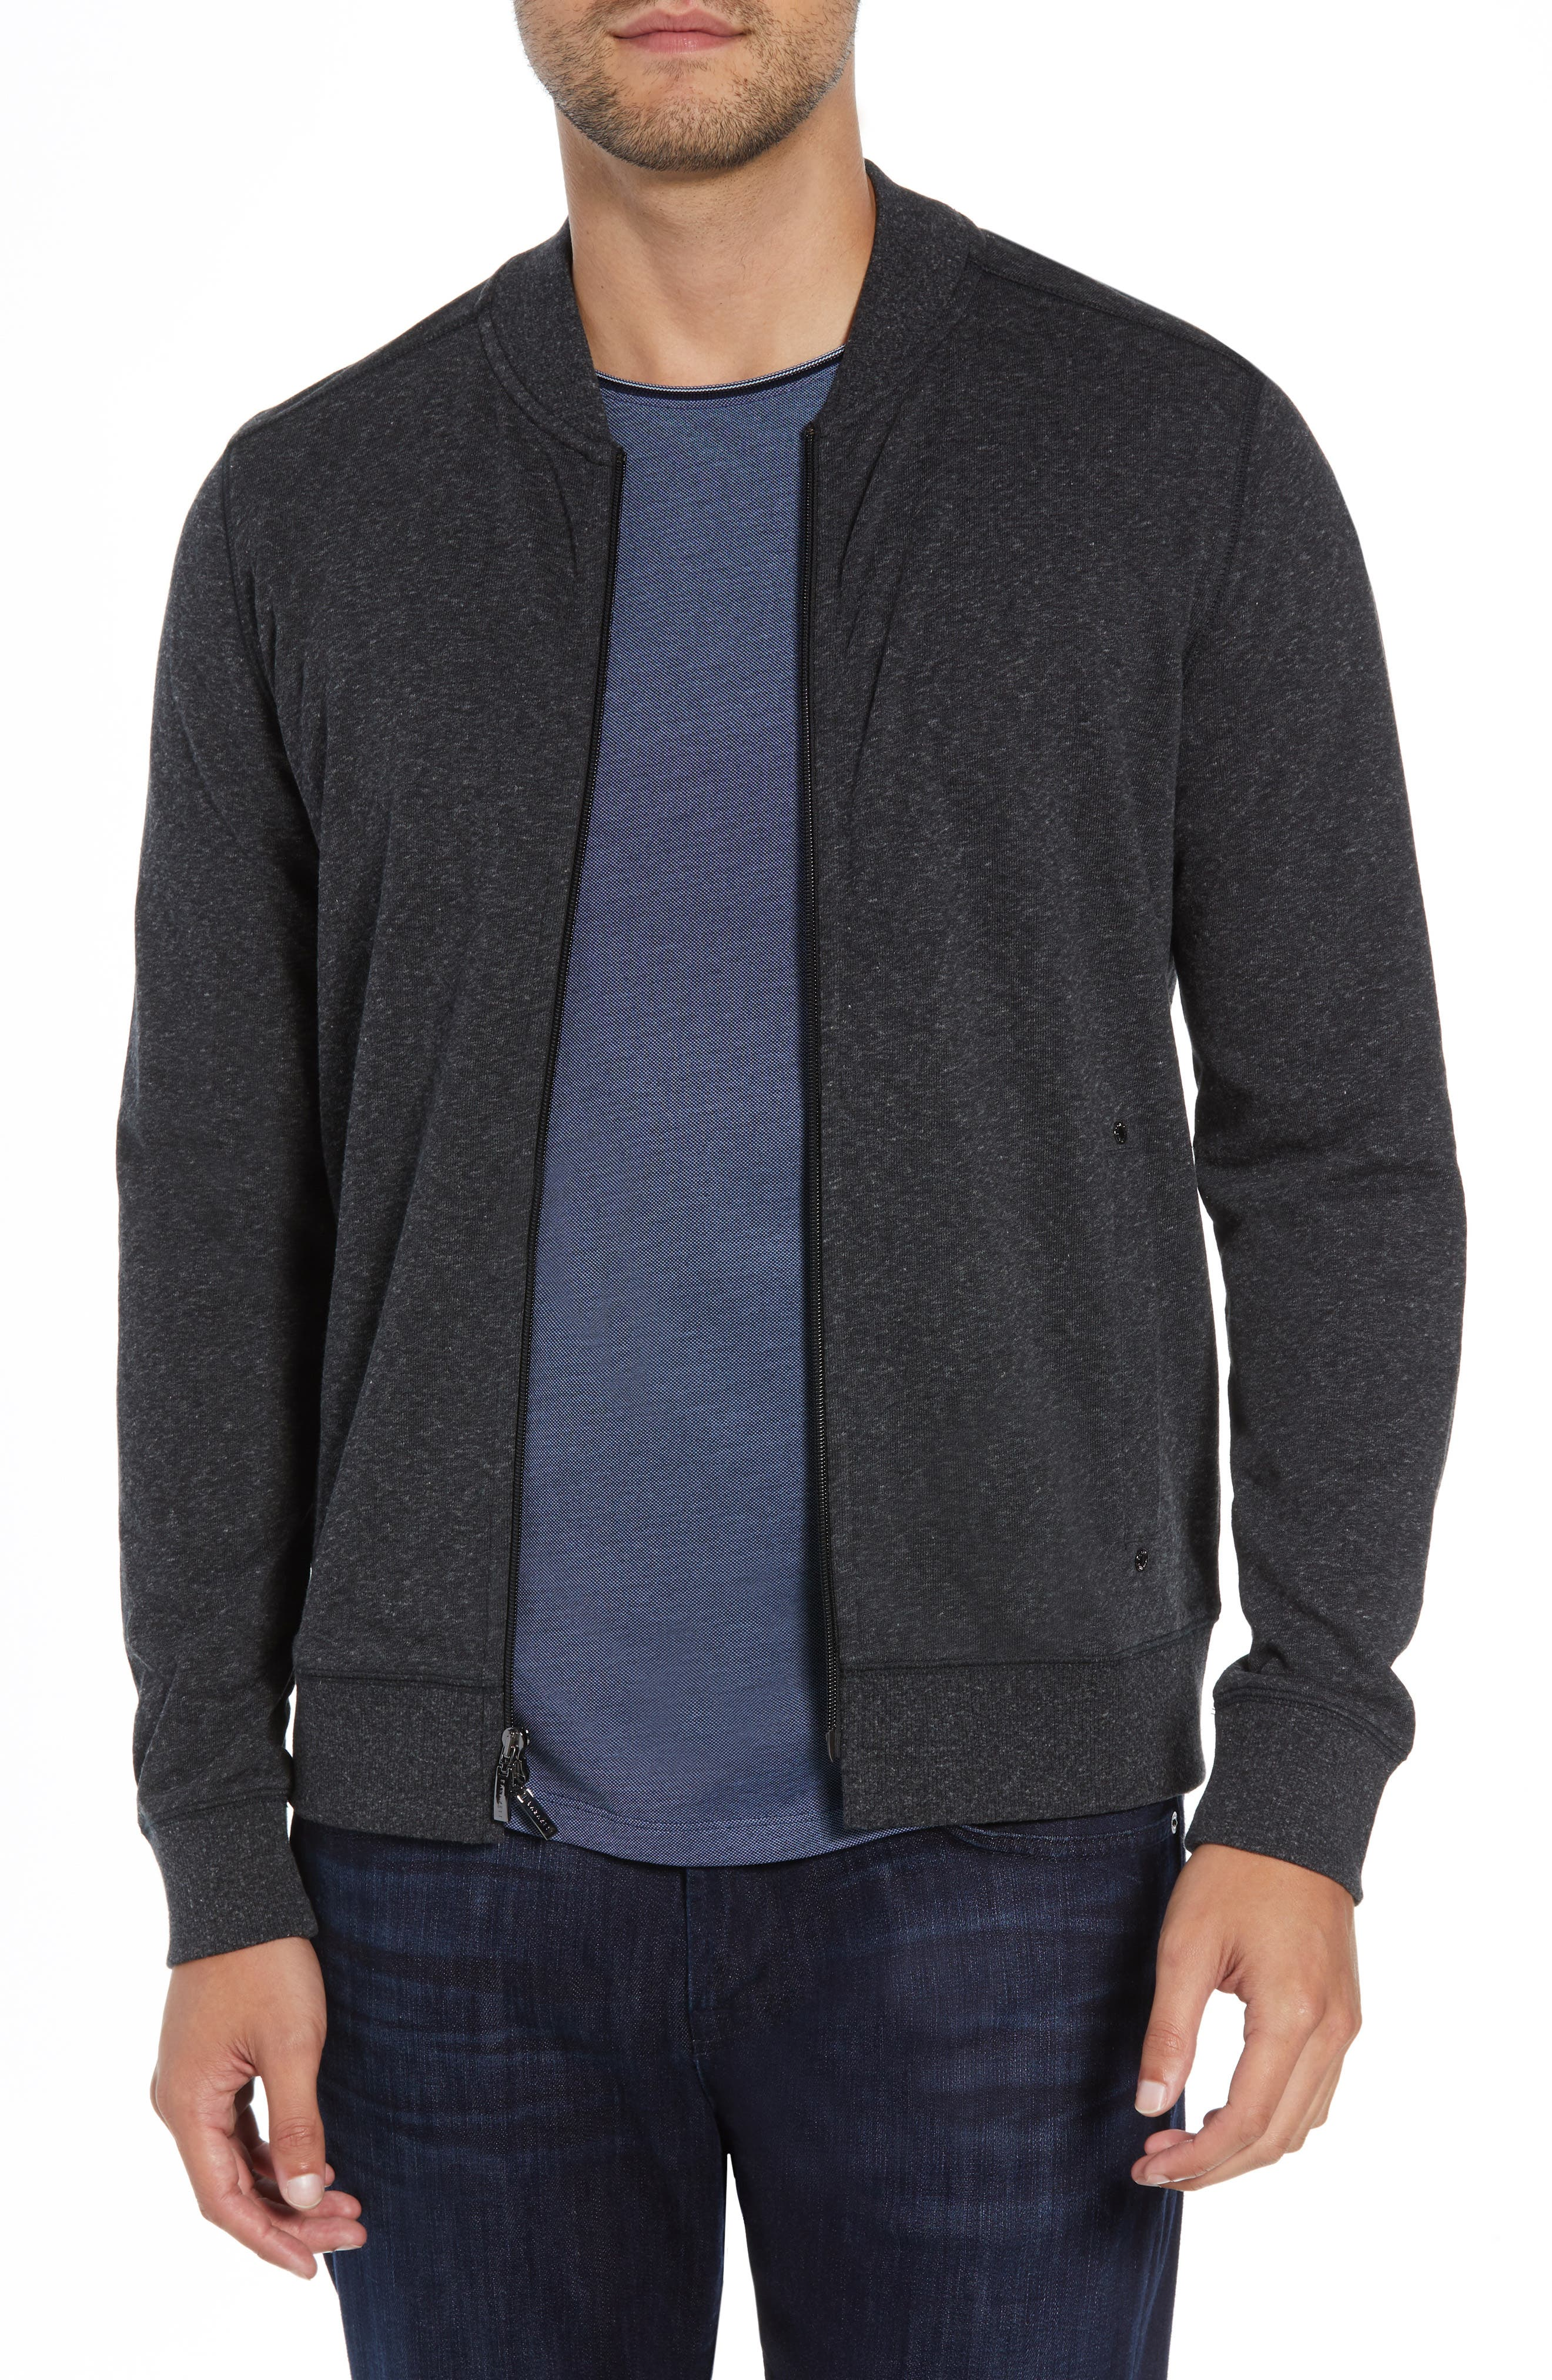 ROBERT BARAKETT, Front Zip Knit Jacket, Main thumbnail 1, color, BLACK